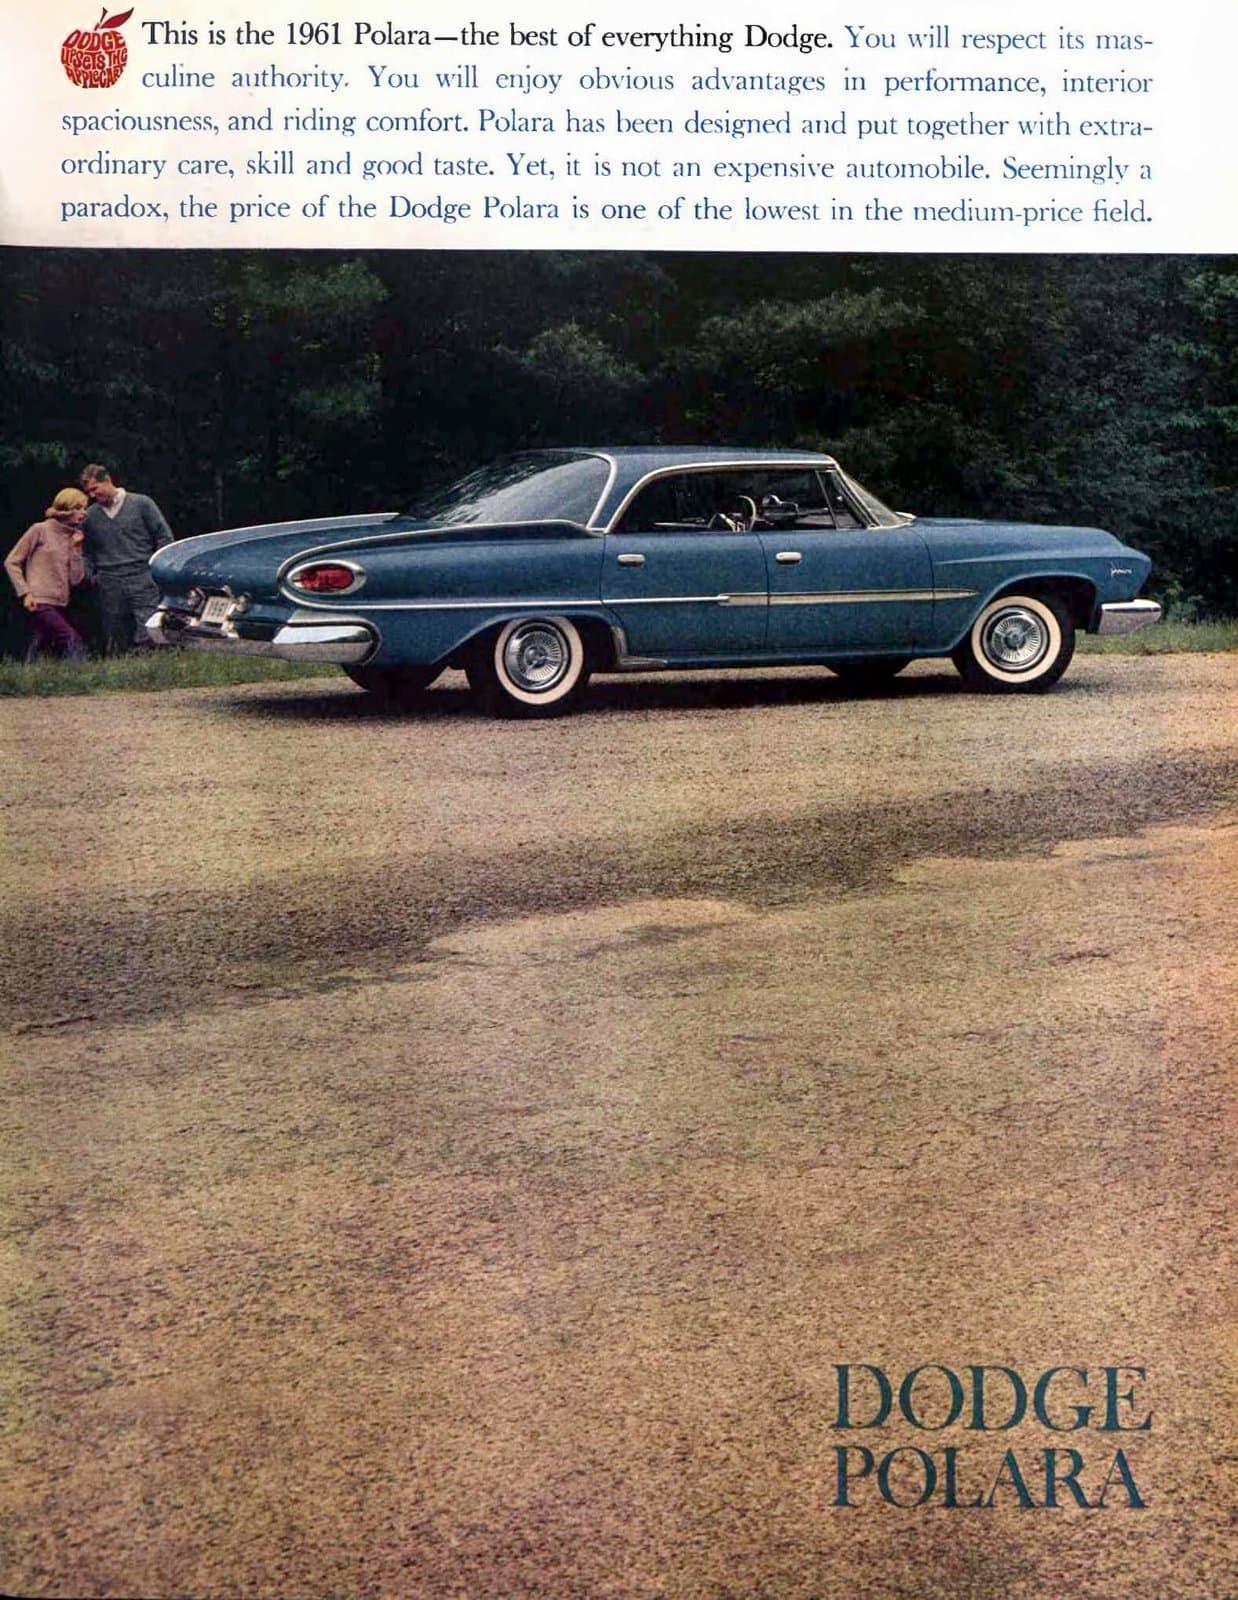 Vintage 1961 Dodge Polara